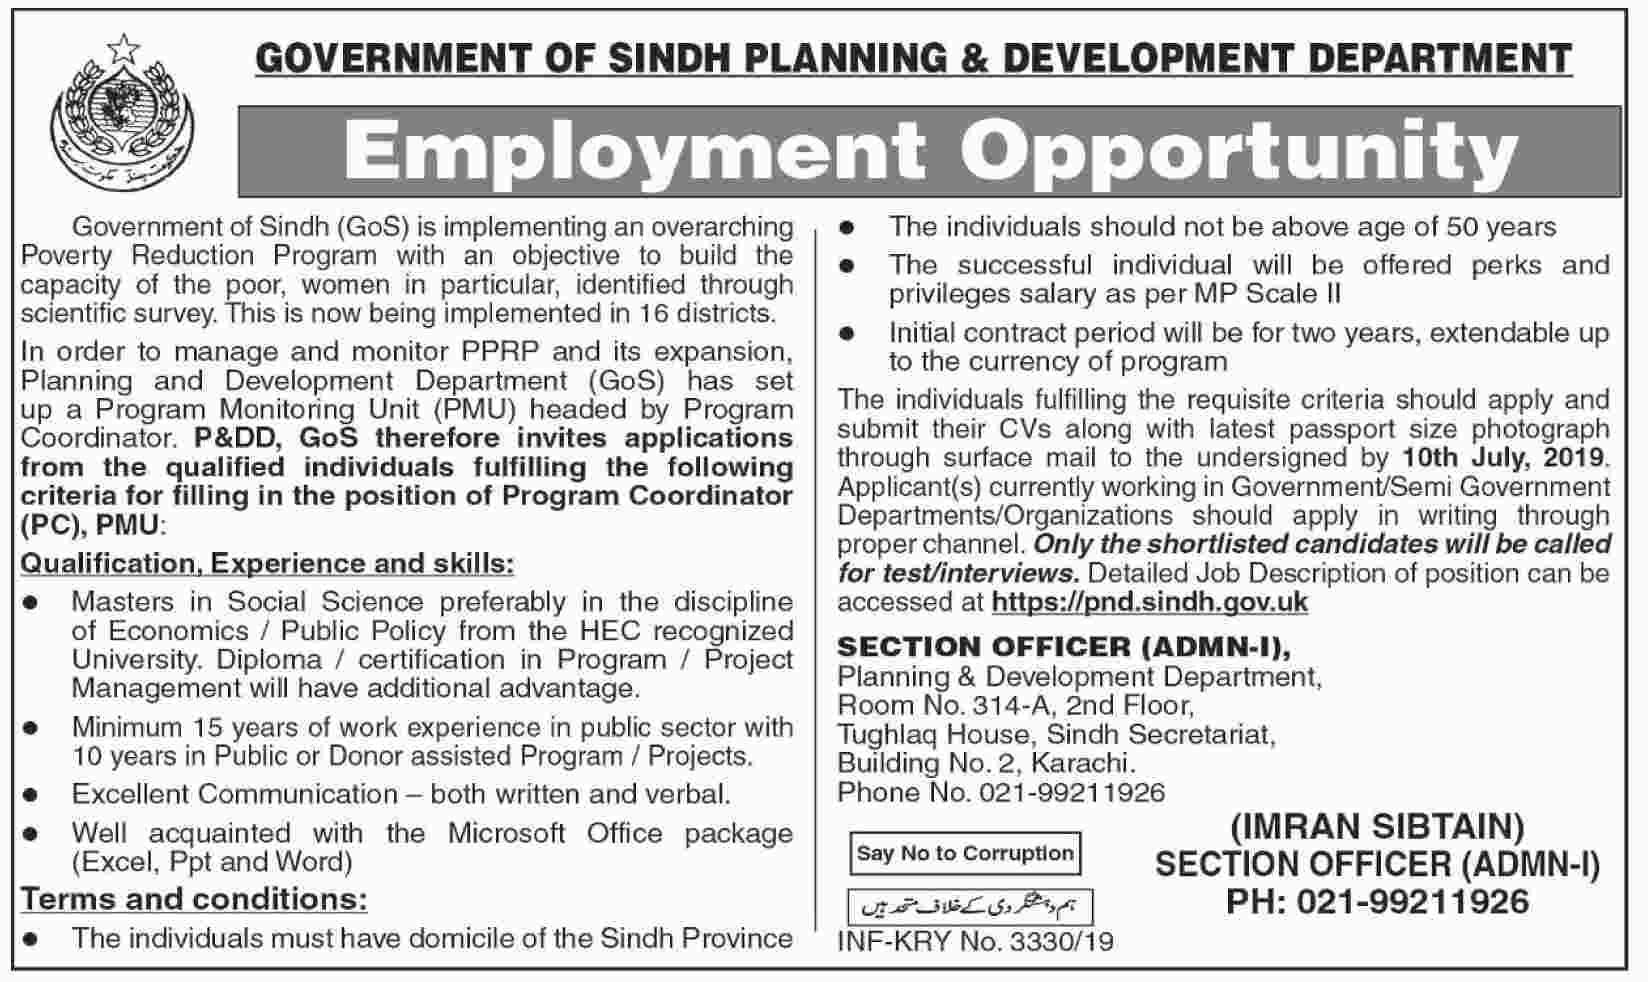 Planning & Development Department Jobs in Karachi